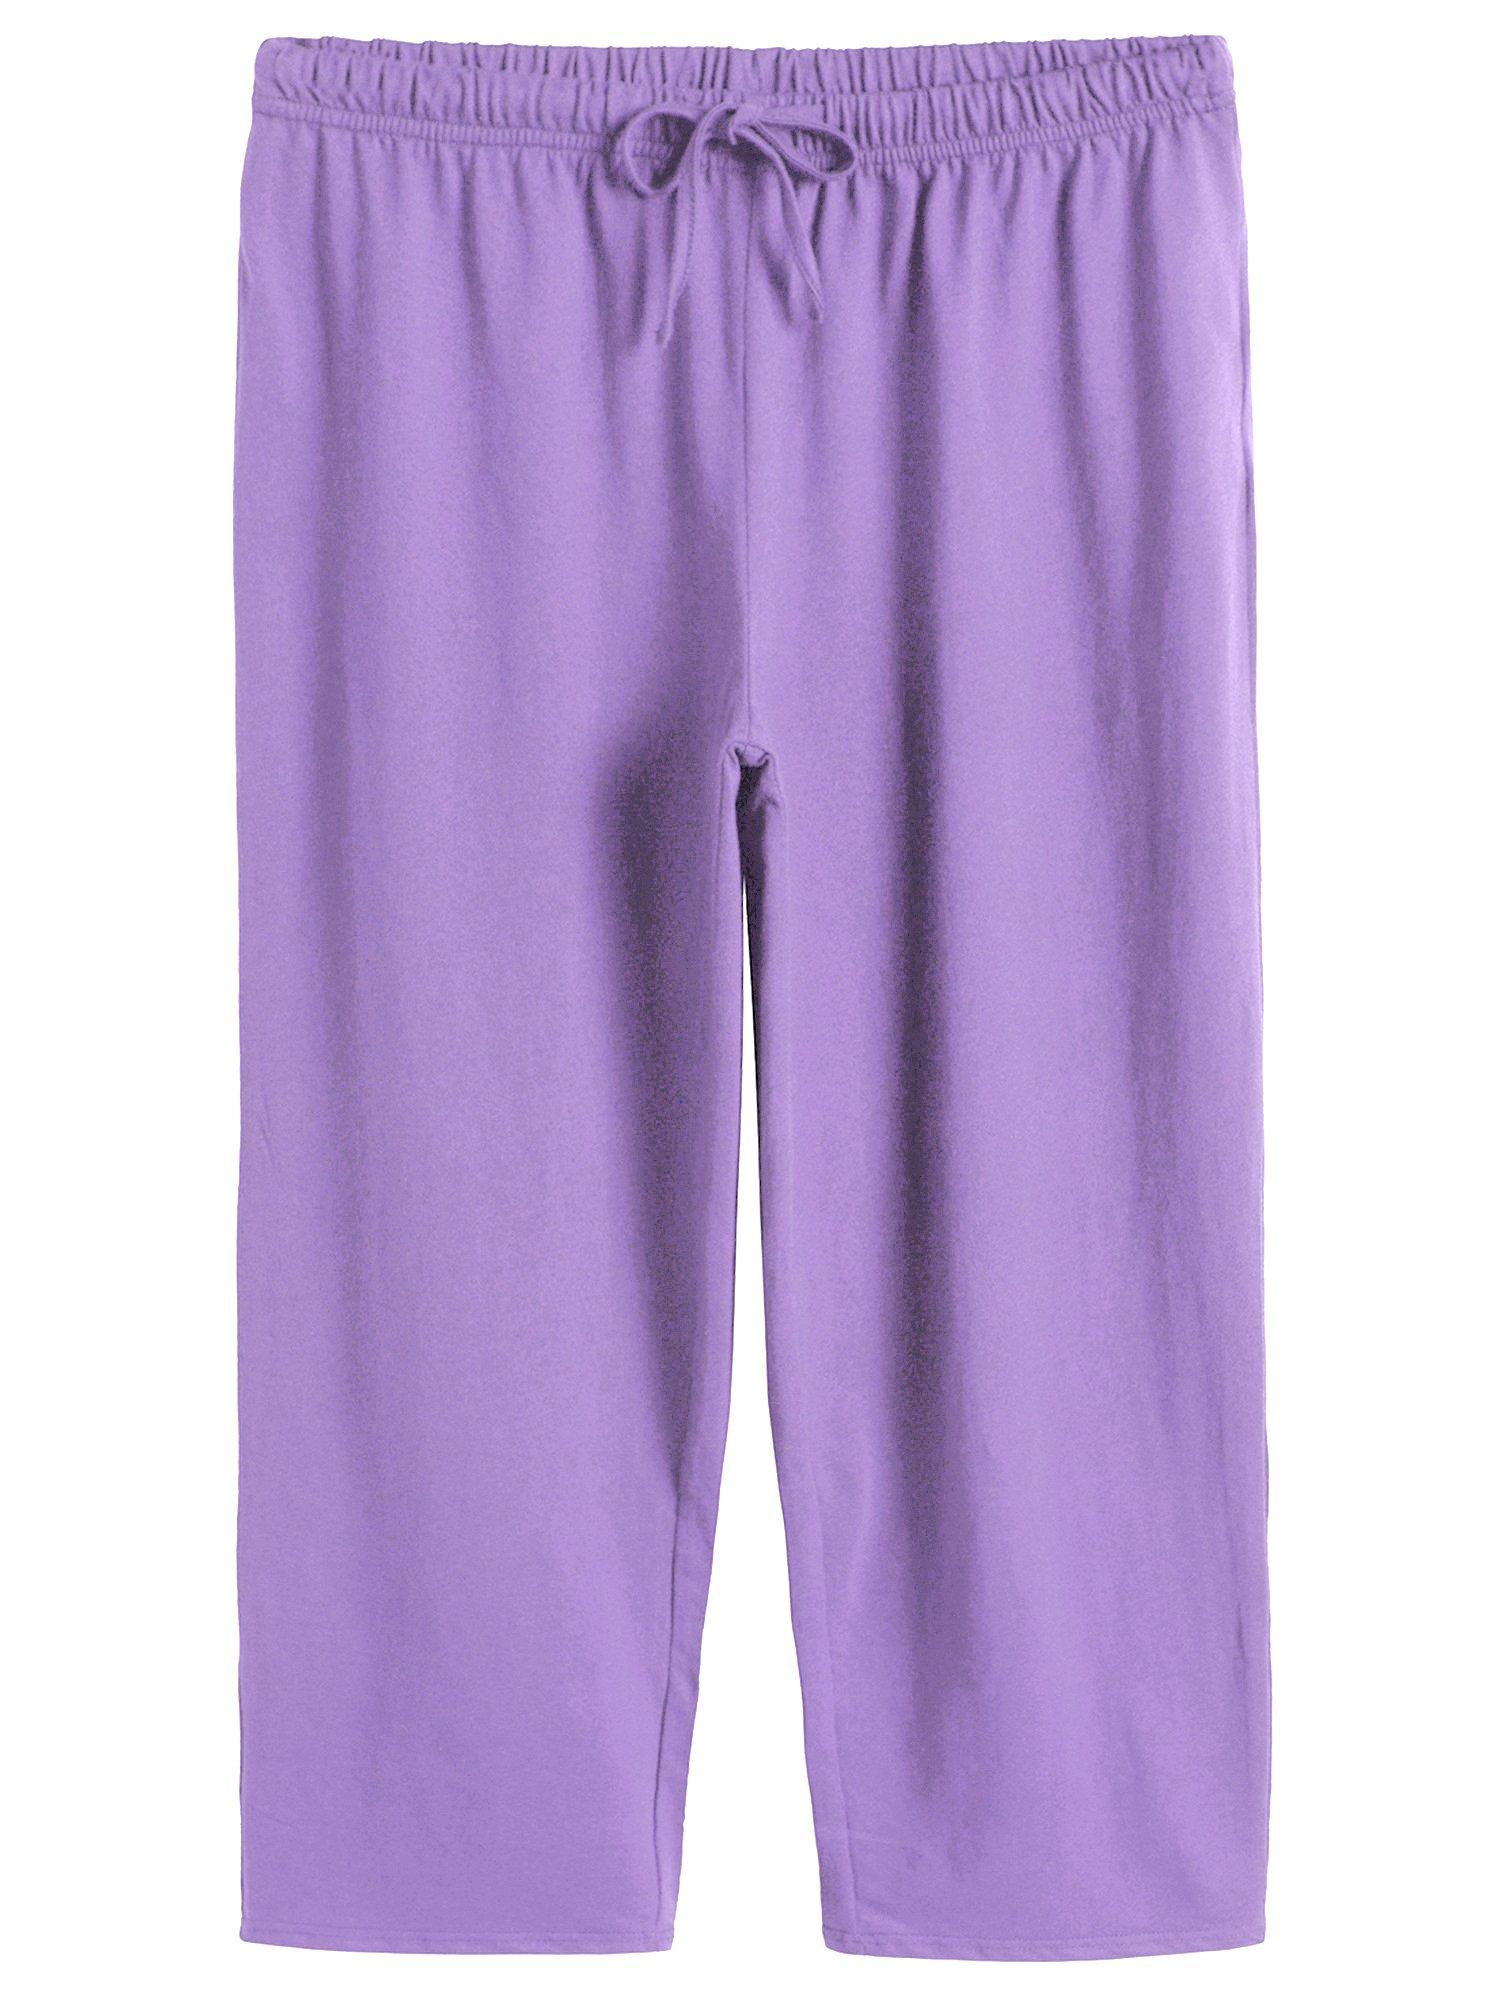 1849dbe248 Latuza Women s Cotton Capri Pants Sleep Capris M Purple